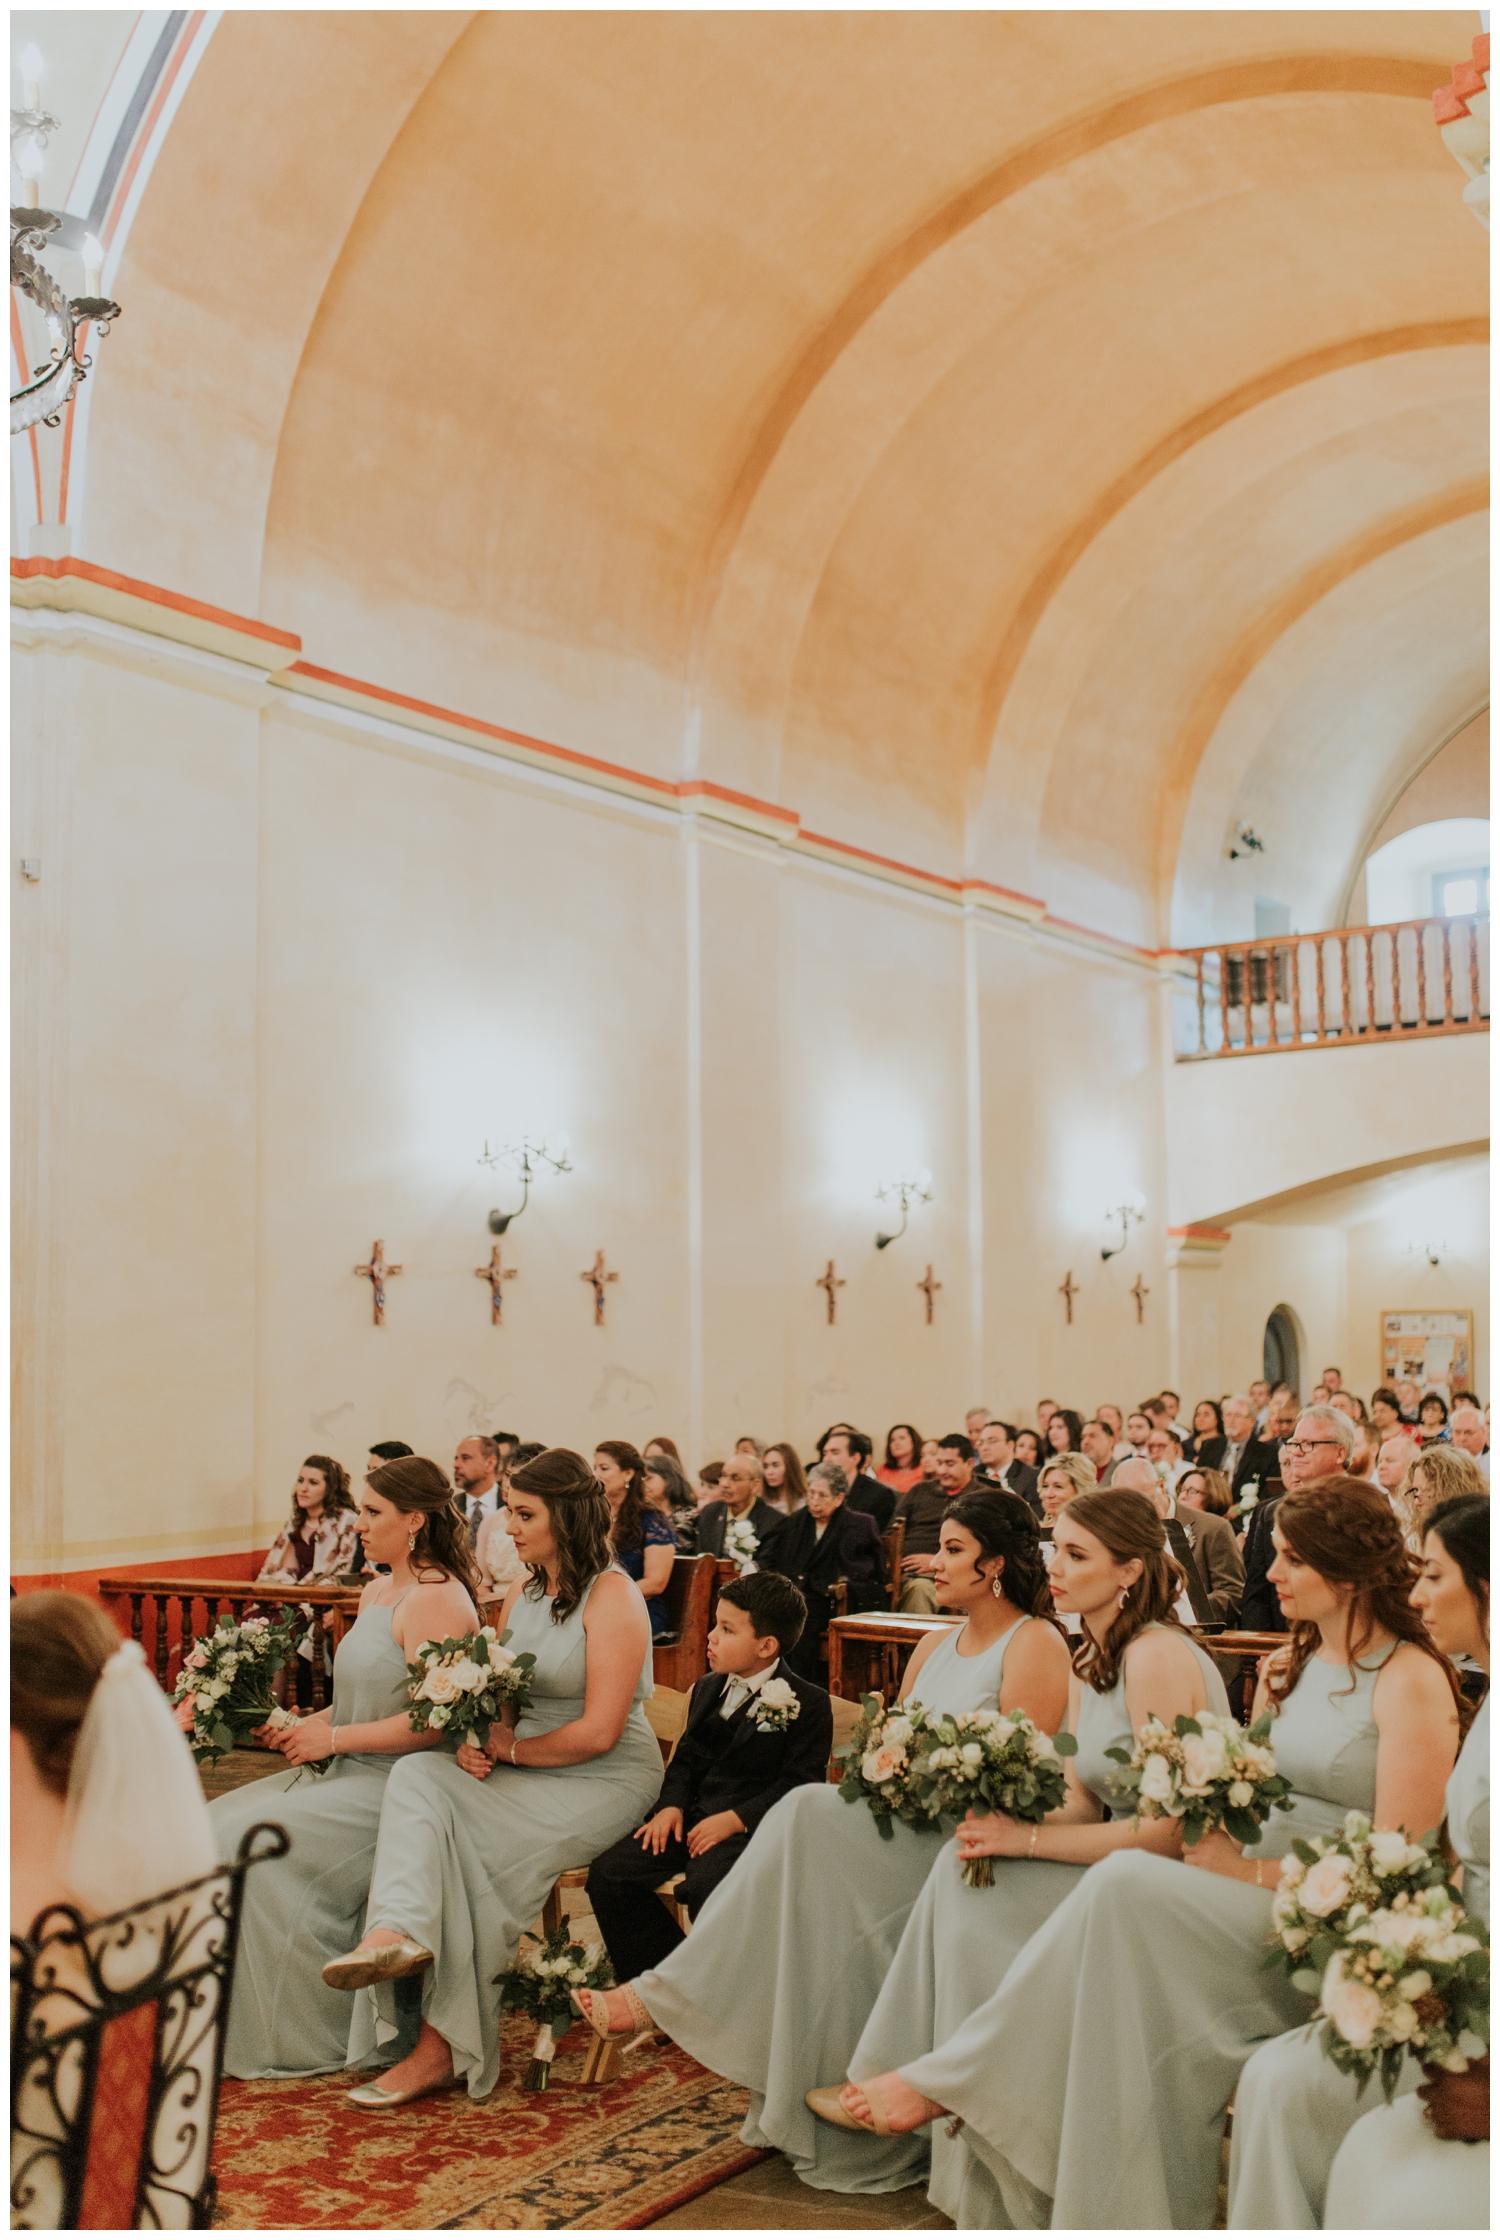 Jenna+Brandon, Mission Concepcion Wedding, San Antonio, Contista Productions Wedding Photography_0048.jpg